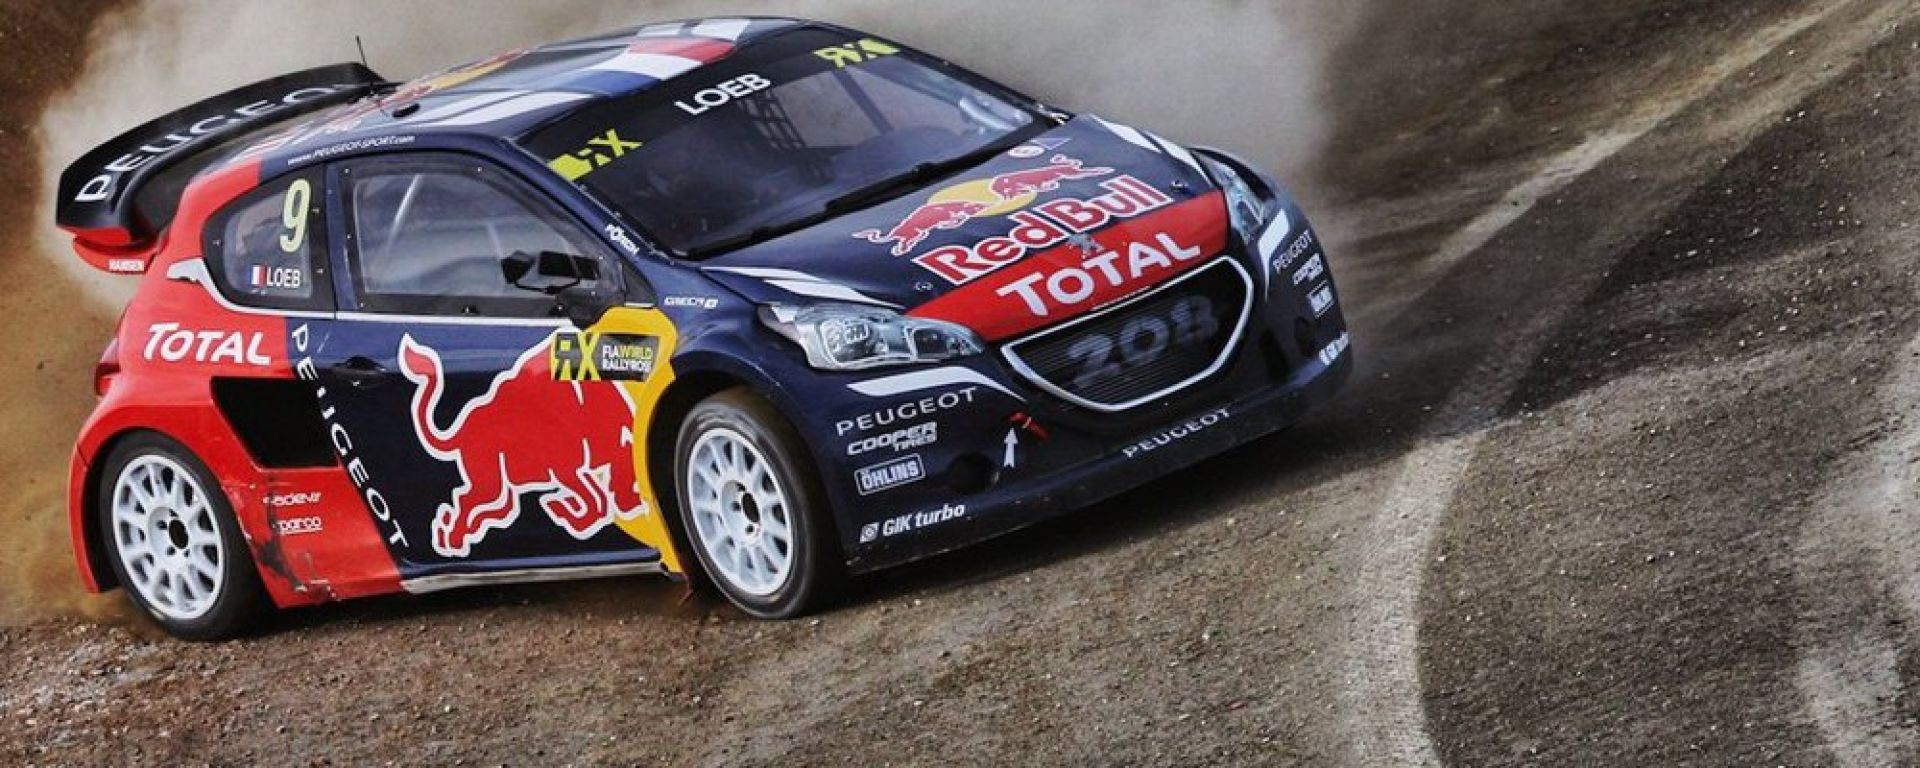 Team Total Peugeot - WRX GP Loheac